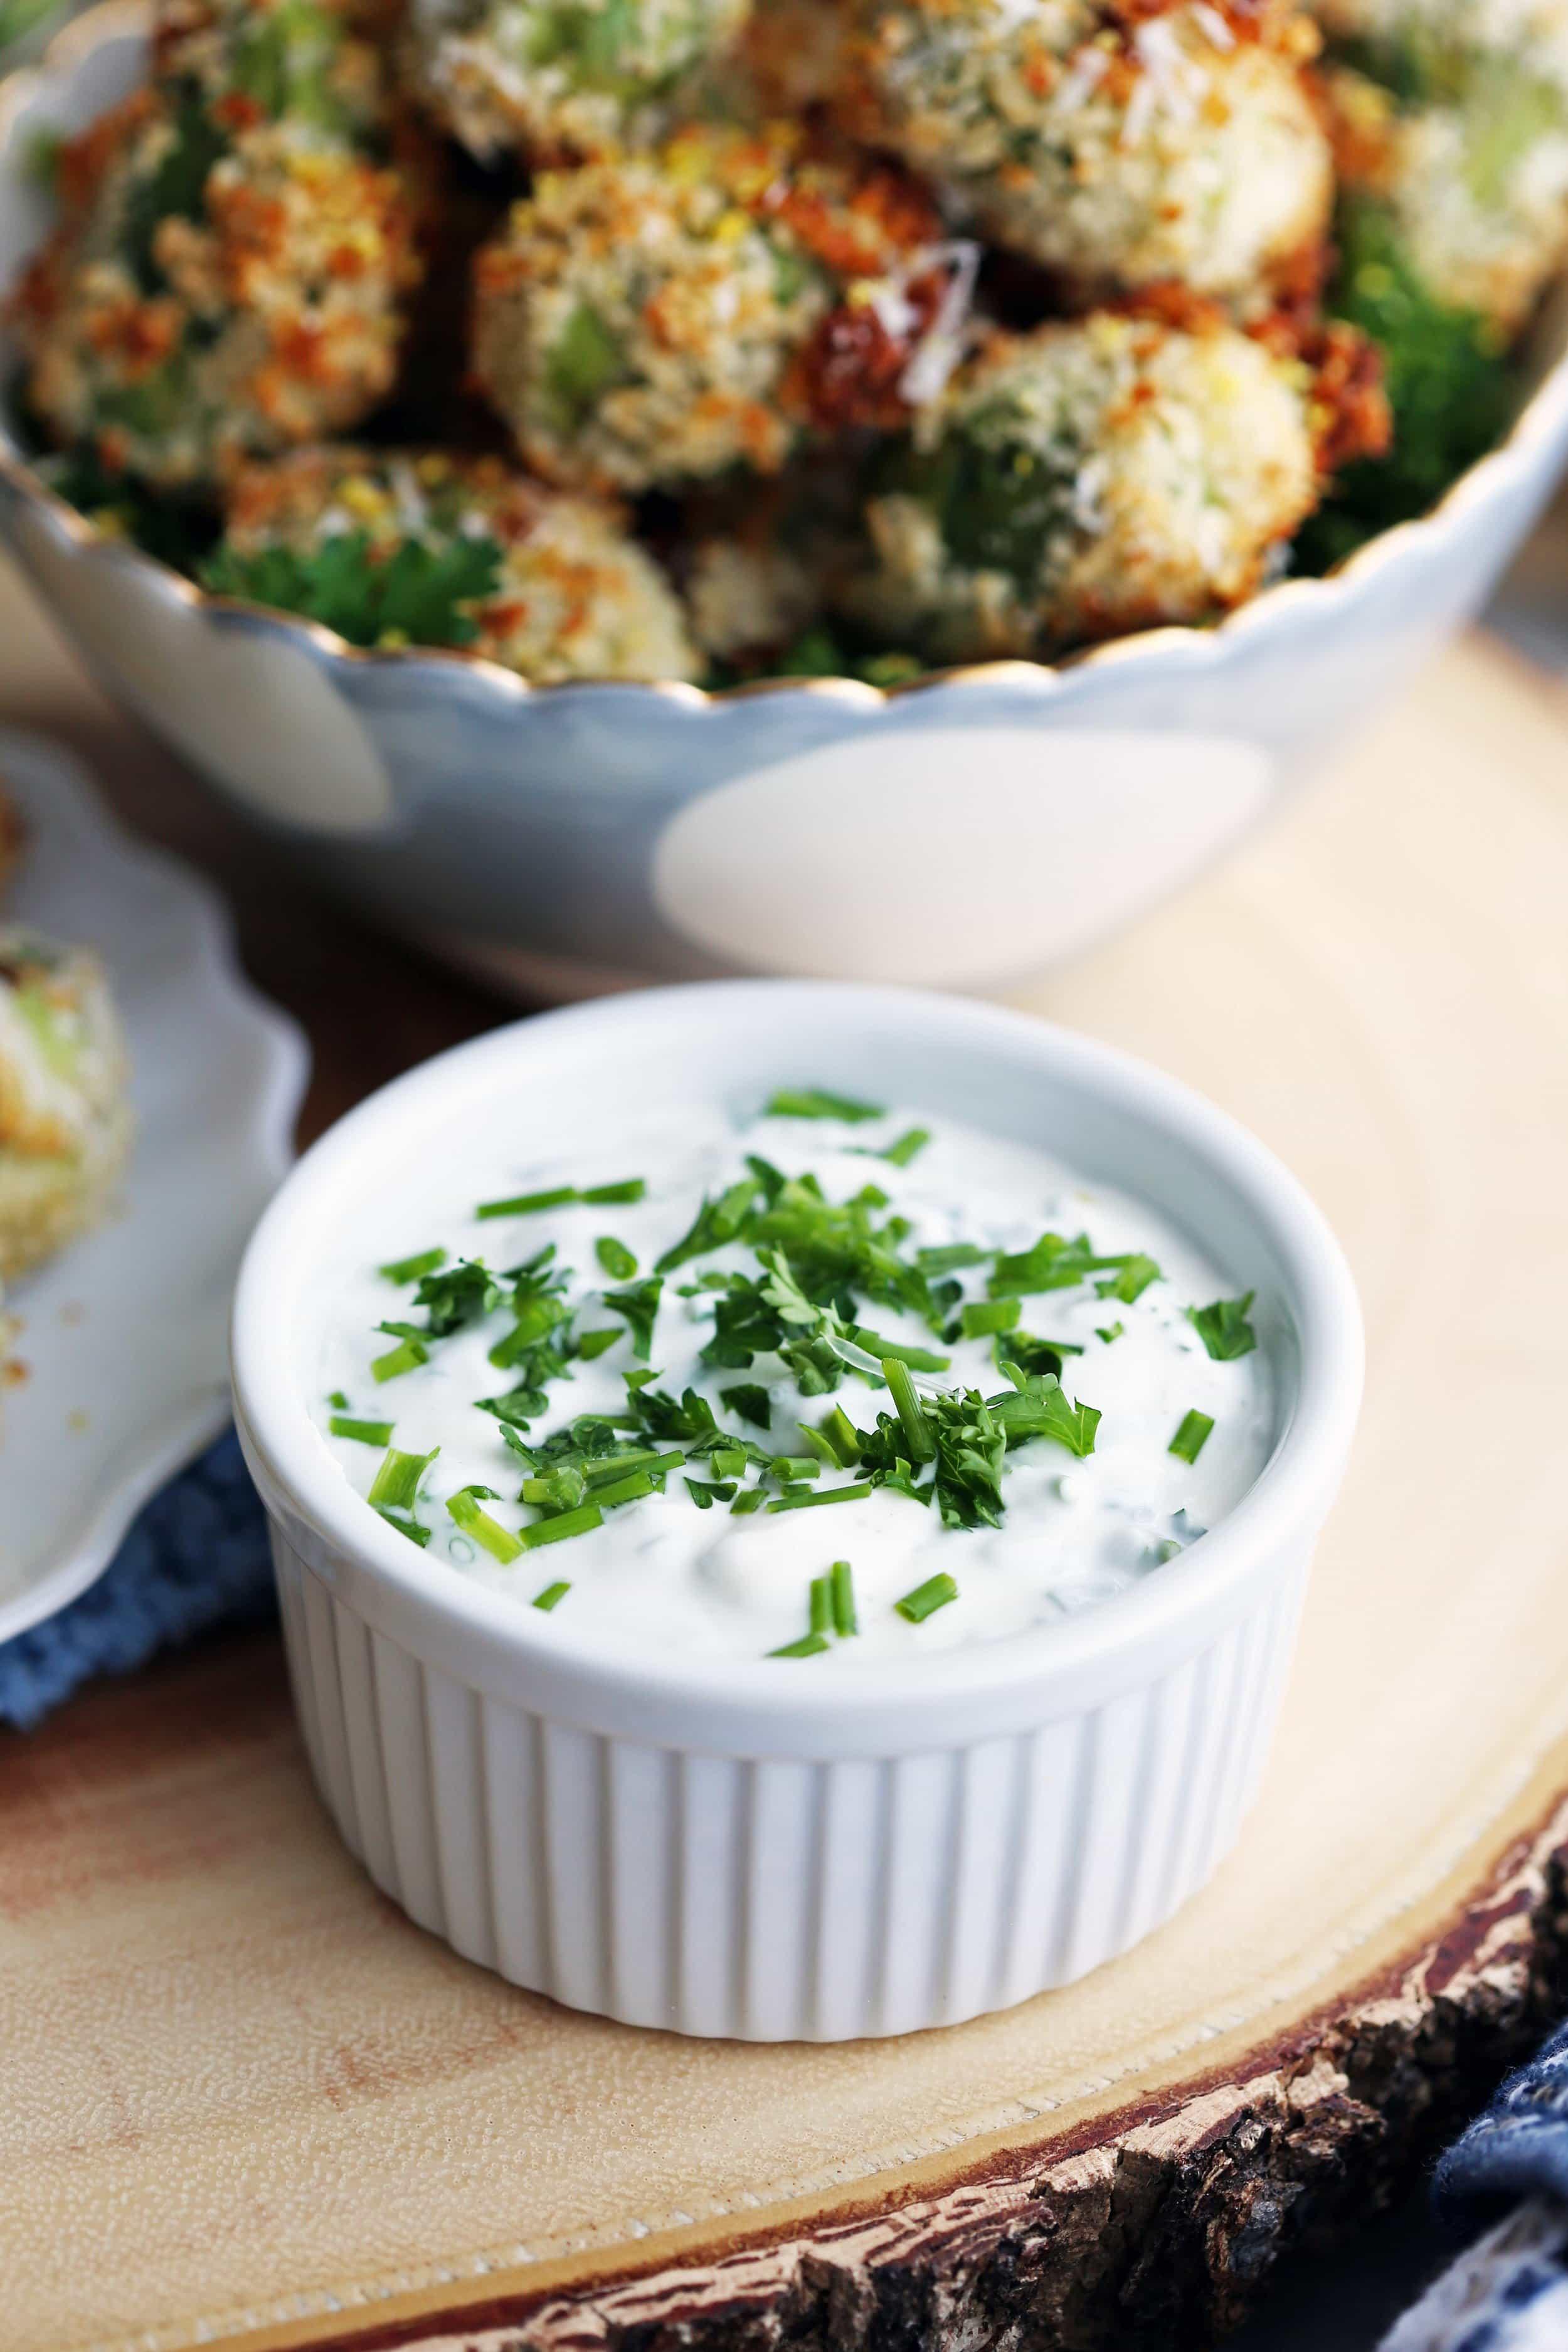 Sour cream herb dip in a white ramekin on wooden platter.